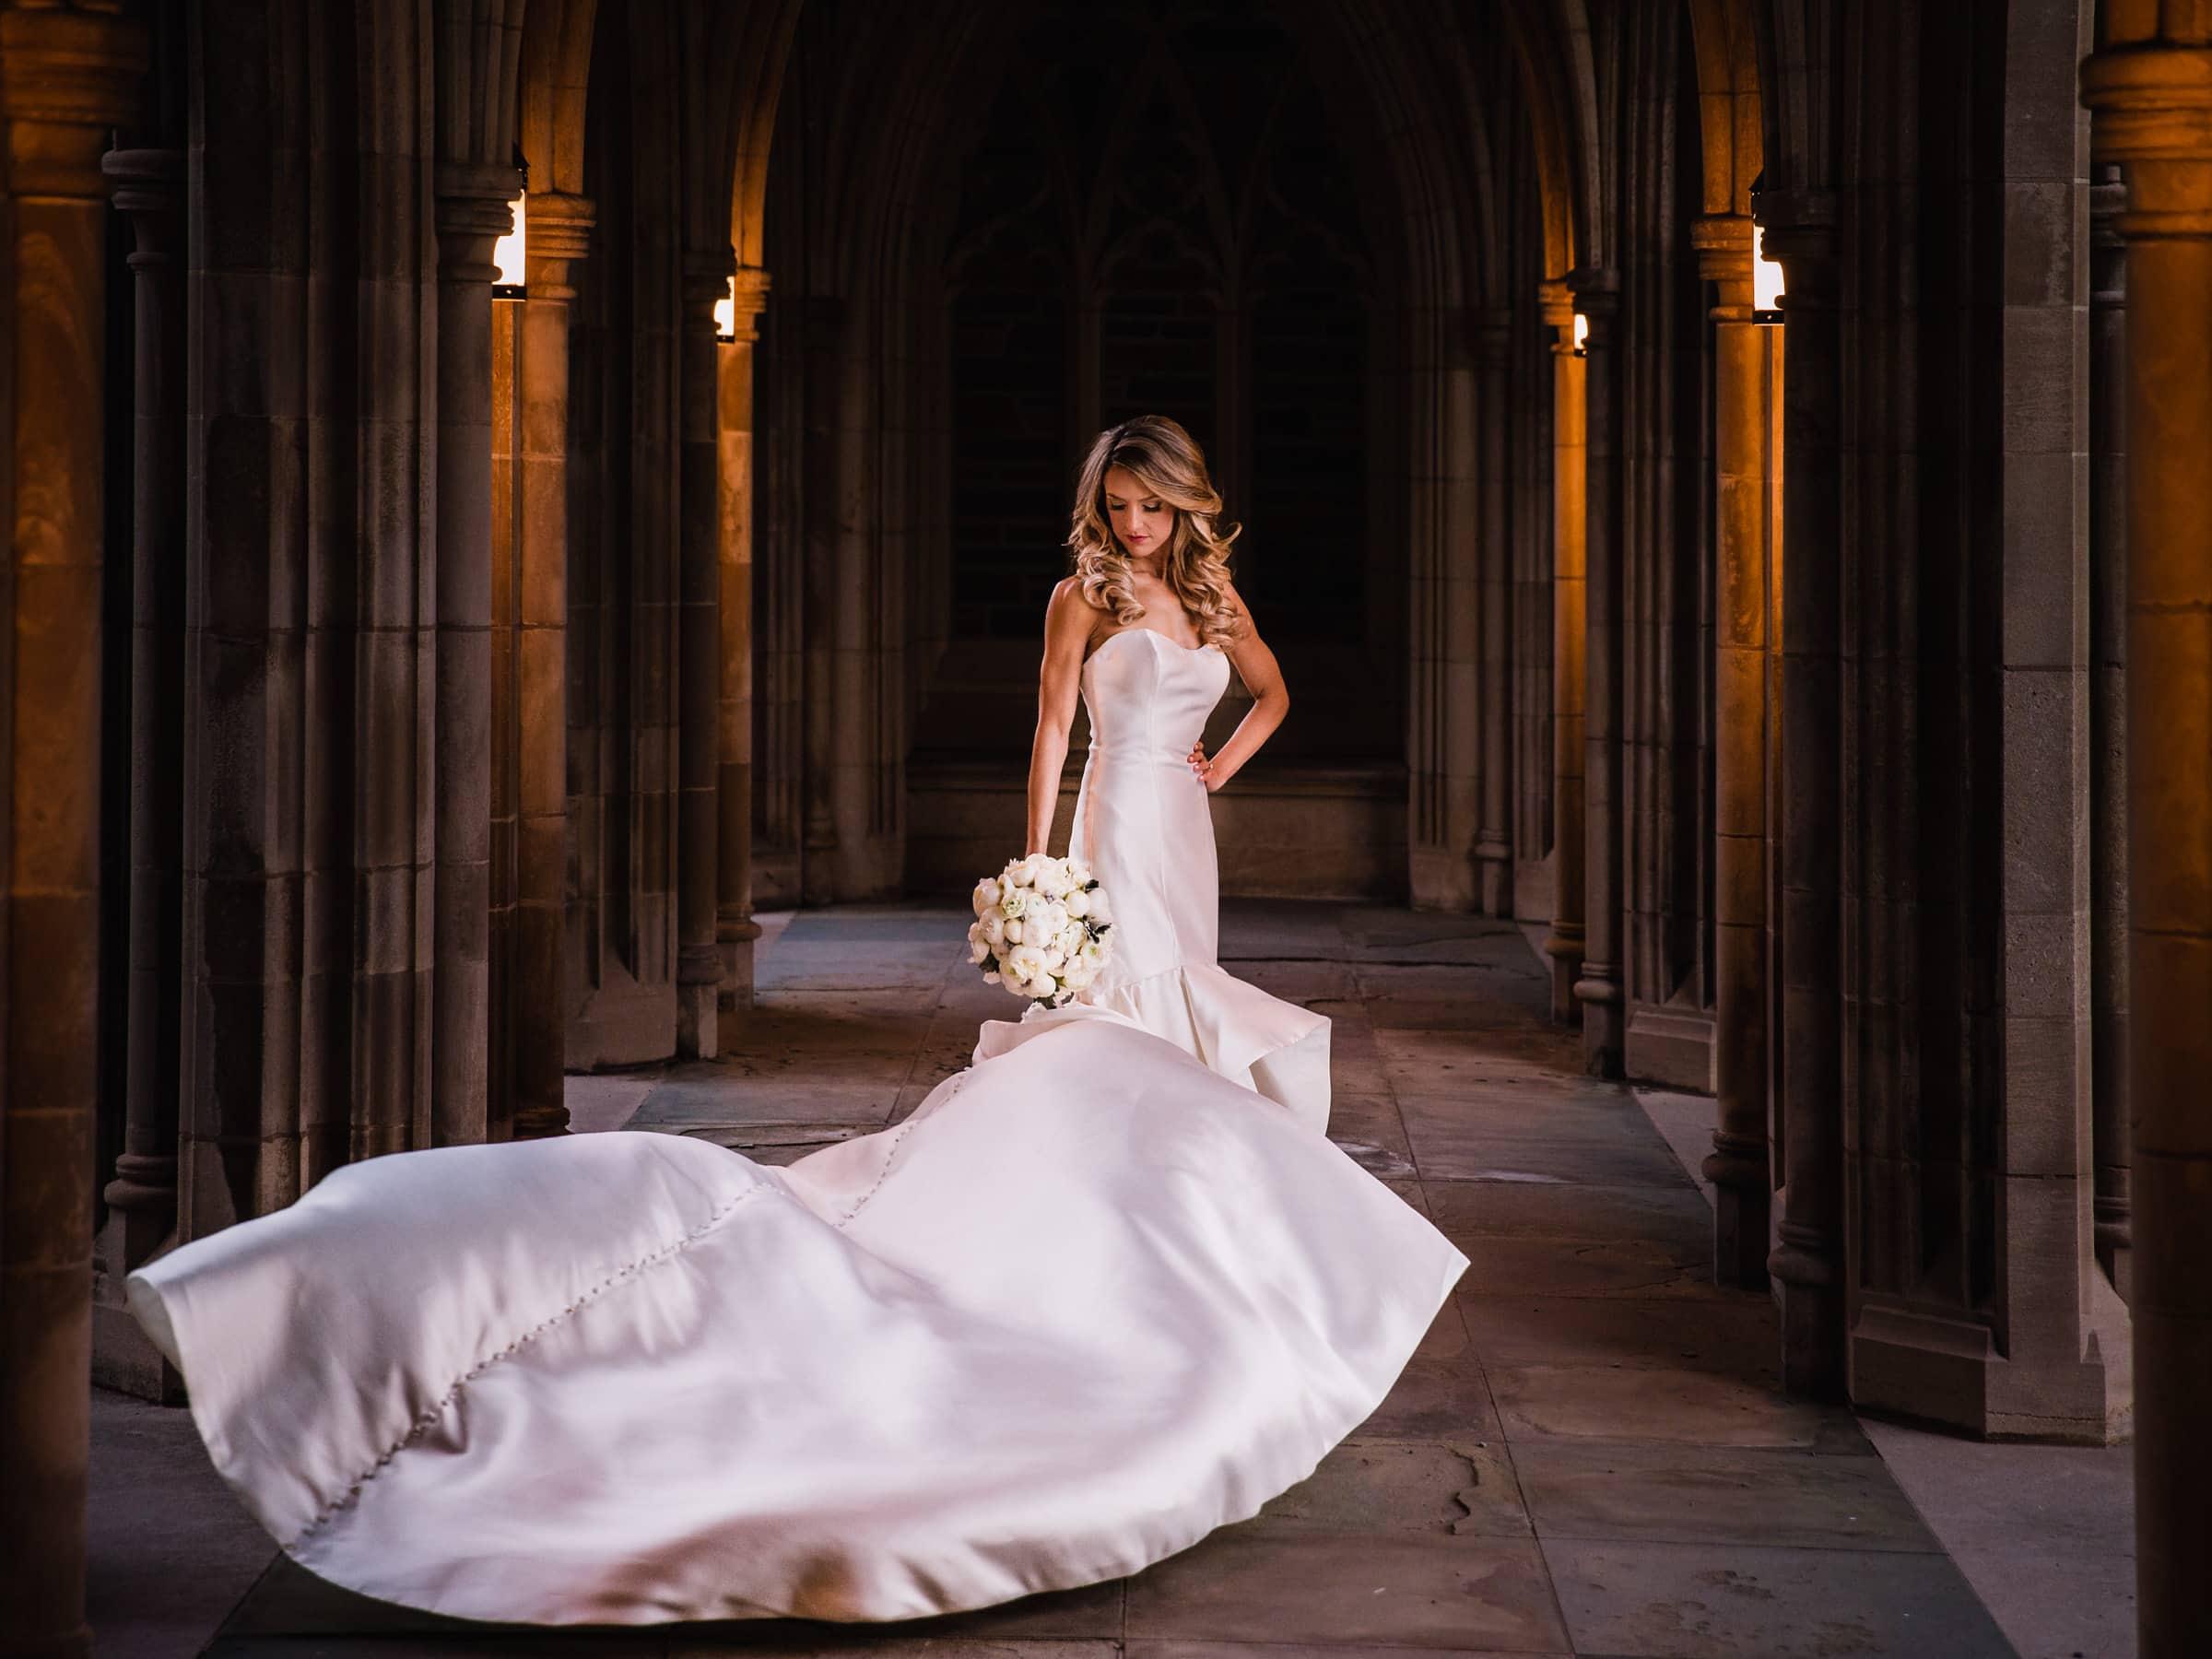 Color Duke Chapel Wedding Photo of Bride in Arcades on her wedding day by Joe Payne